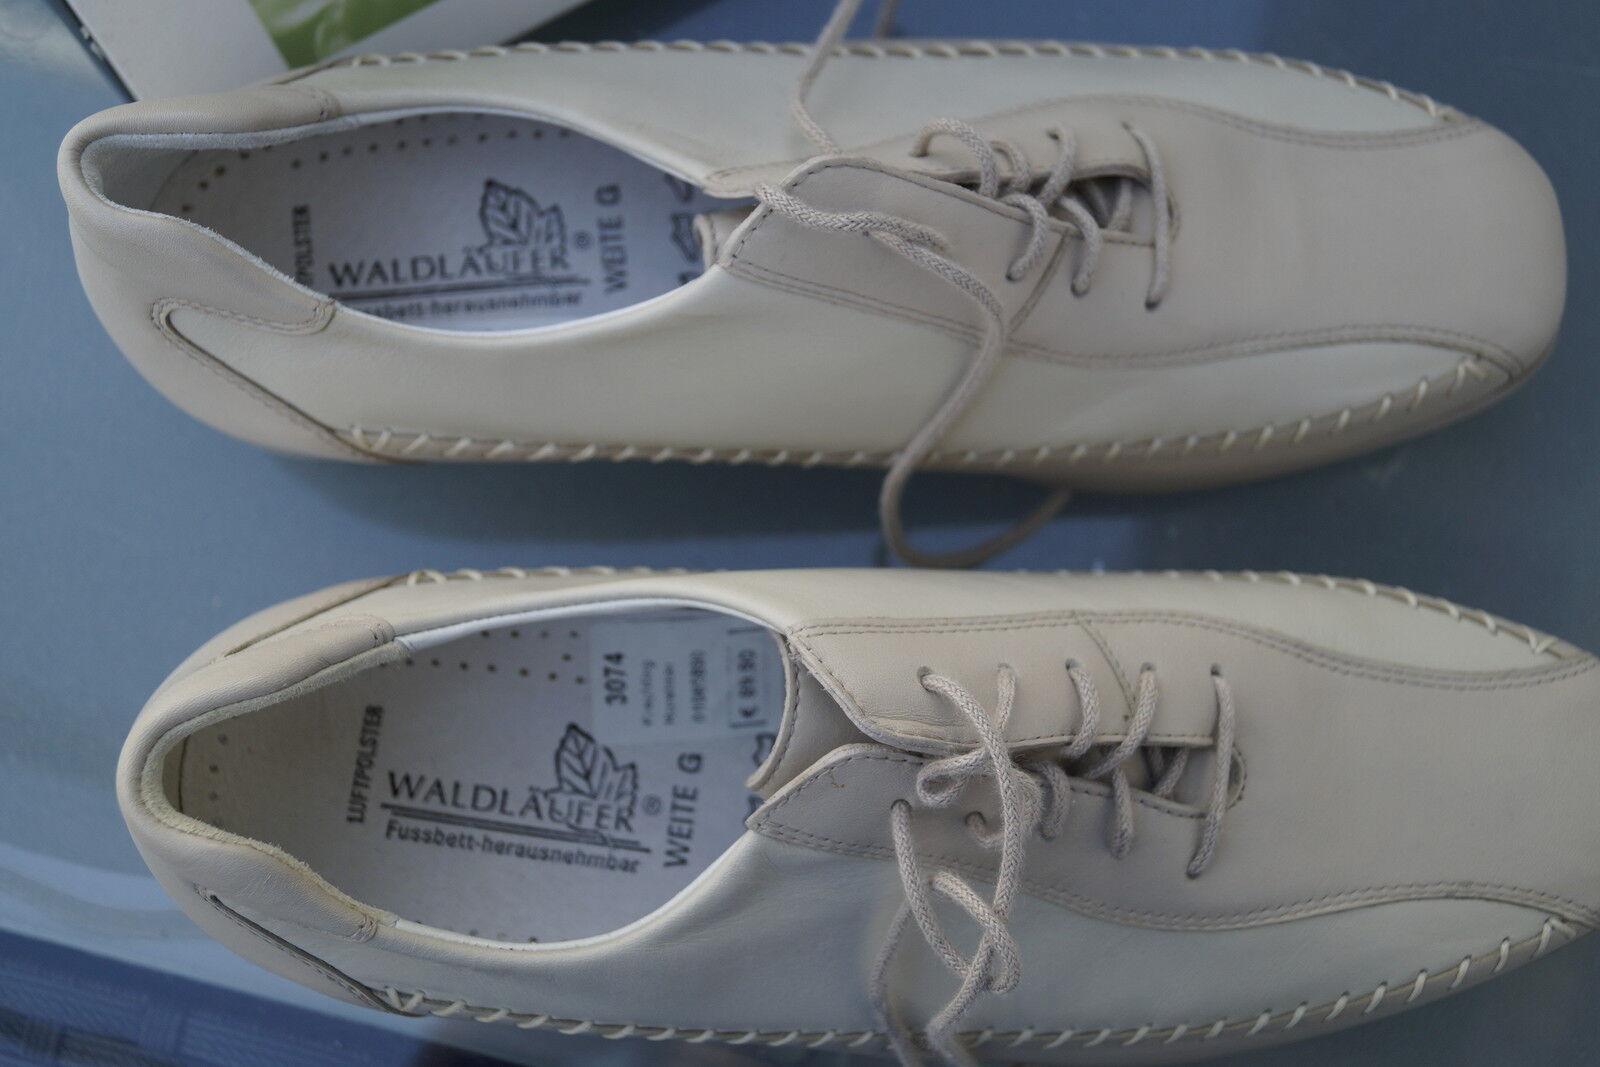 WALDLÄUFER Gerti Damen Comfort Schuhe Gr.5 Slipper Leder creme Einlagen Gr.5 Schuhe G 38 NEU d96046